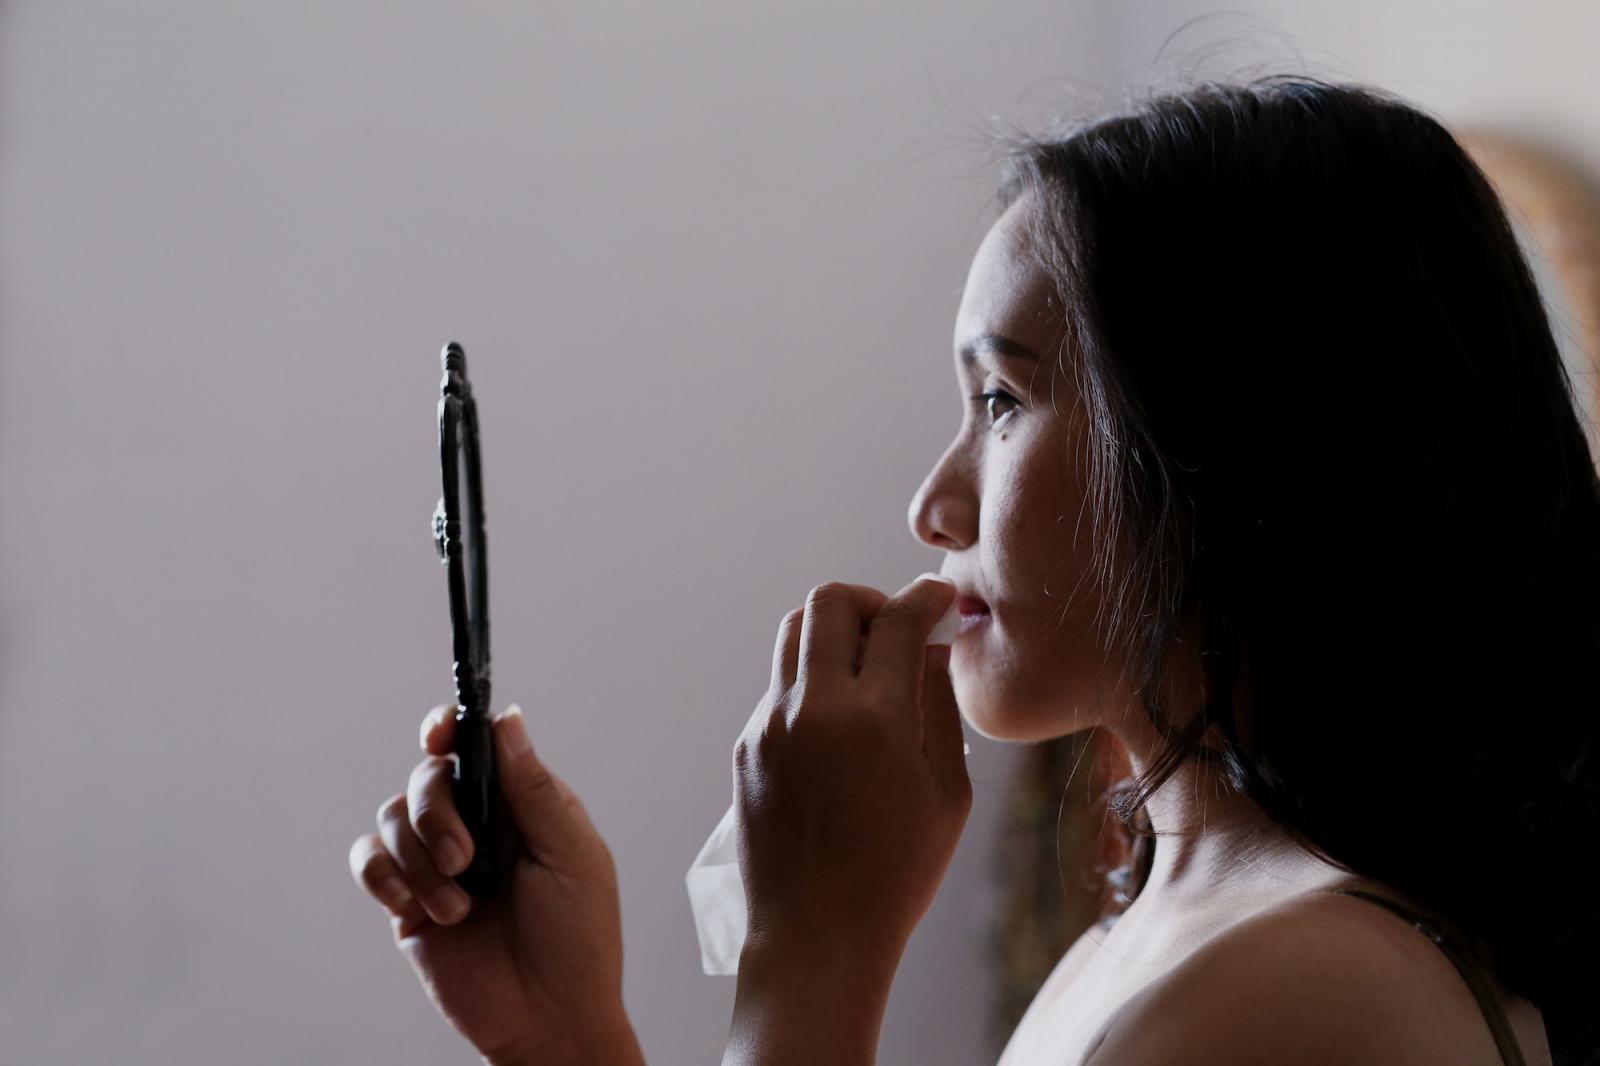 Ella-Bache-Nutridermologie-LAB-Correcteur-Magistral-Pure-Focus-19.3-abloomnova.net_-1600x1066 Applying concealer the makeup artist way